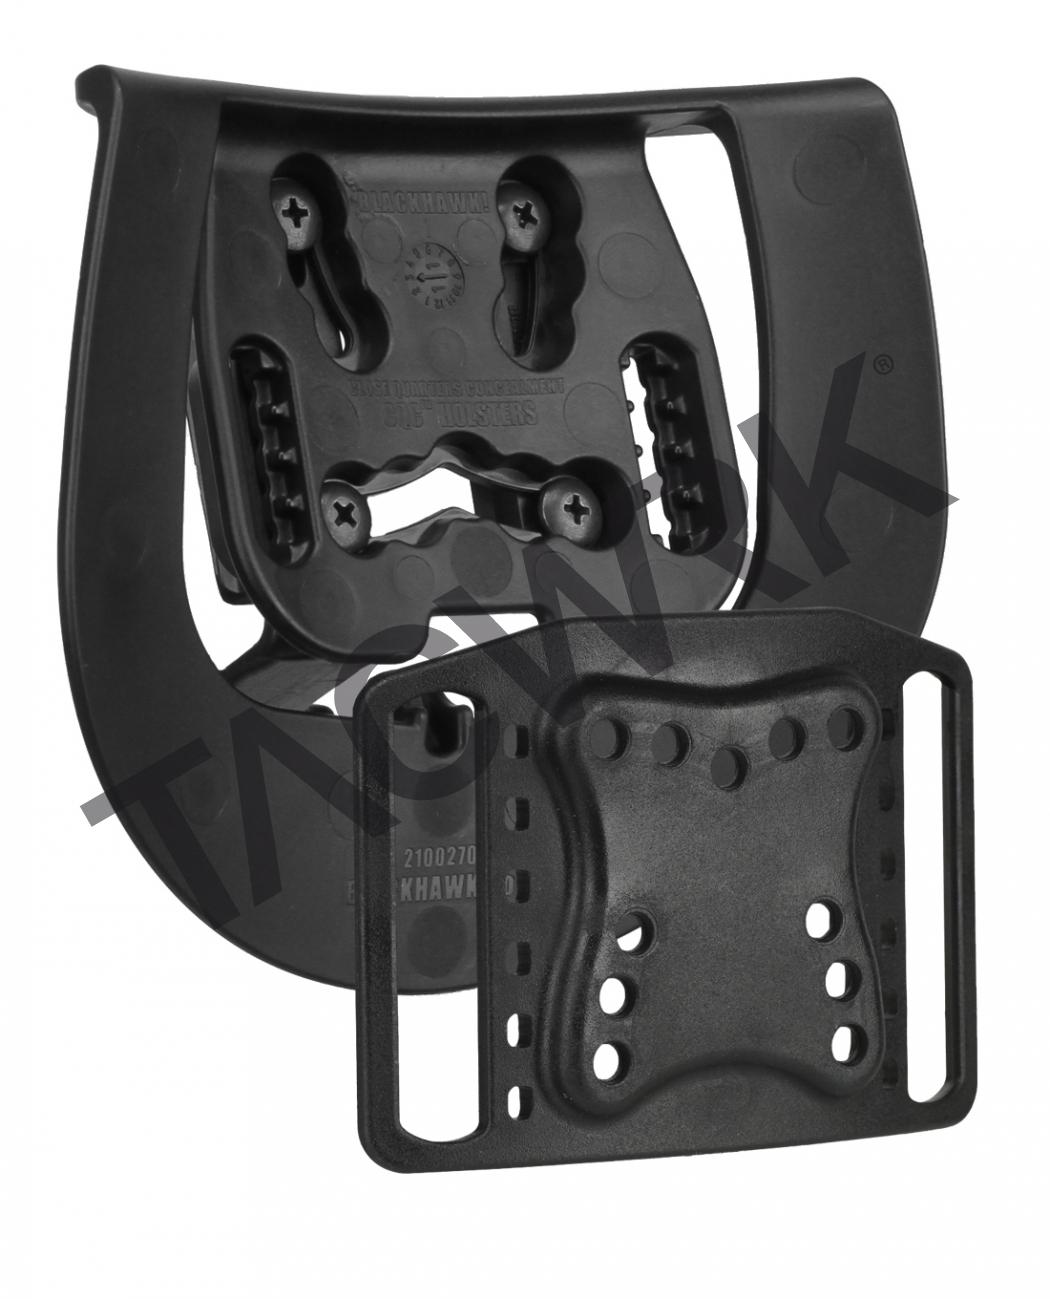 Blackhawk Cqc Serpa Holster Glock 17 22 31 Coyote Tan